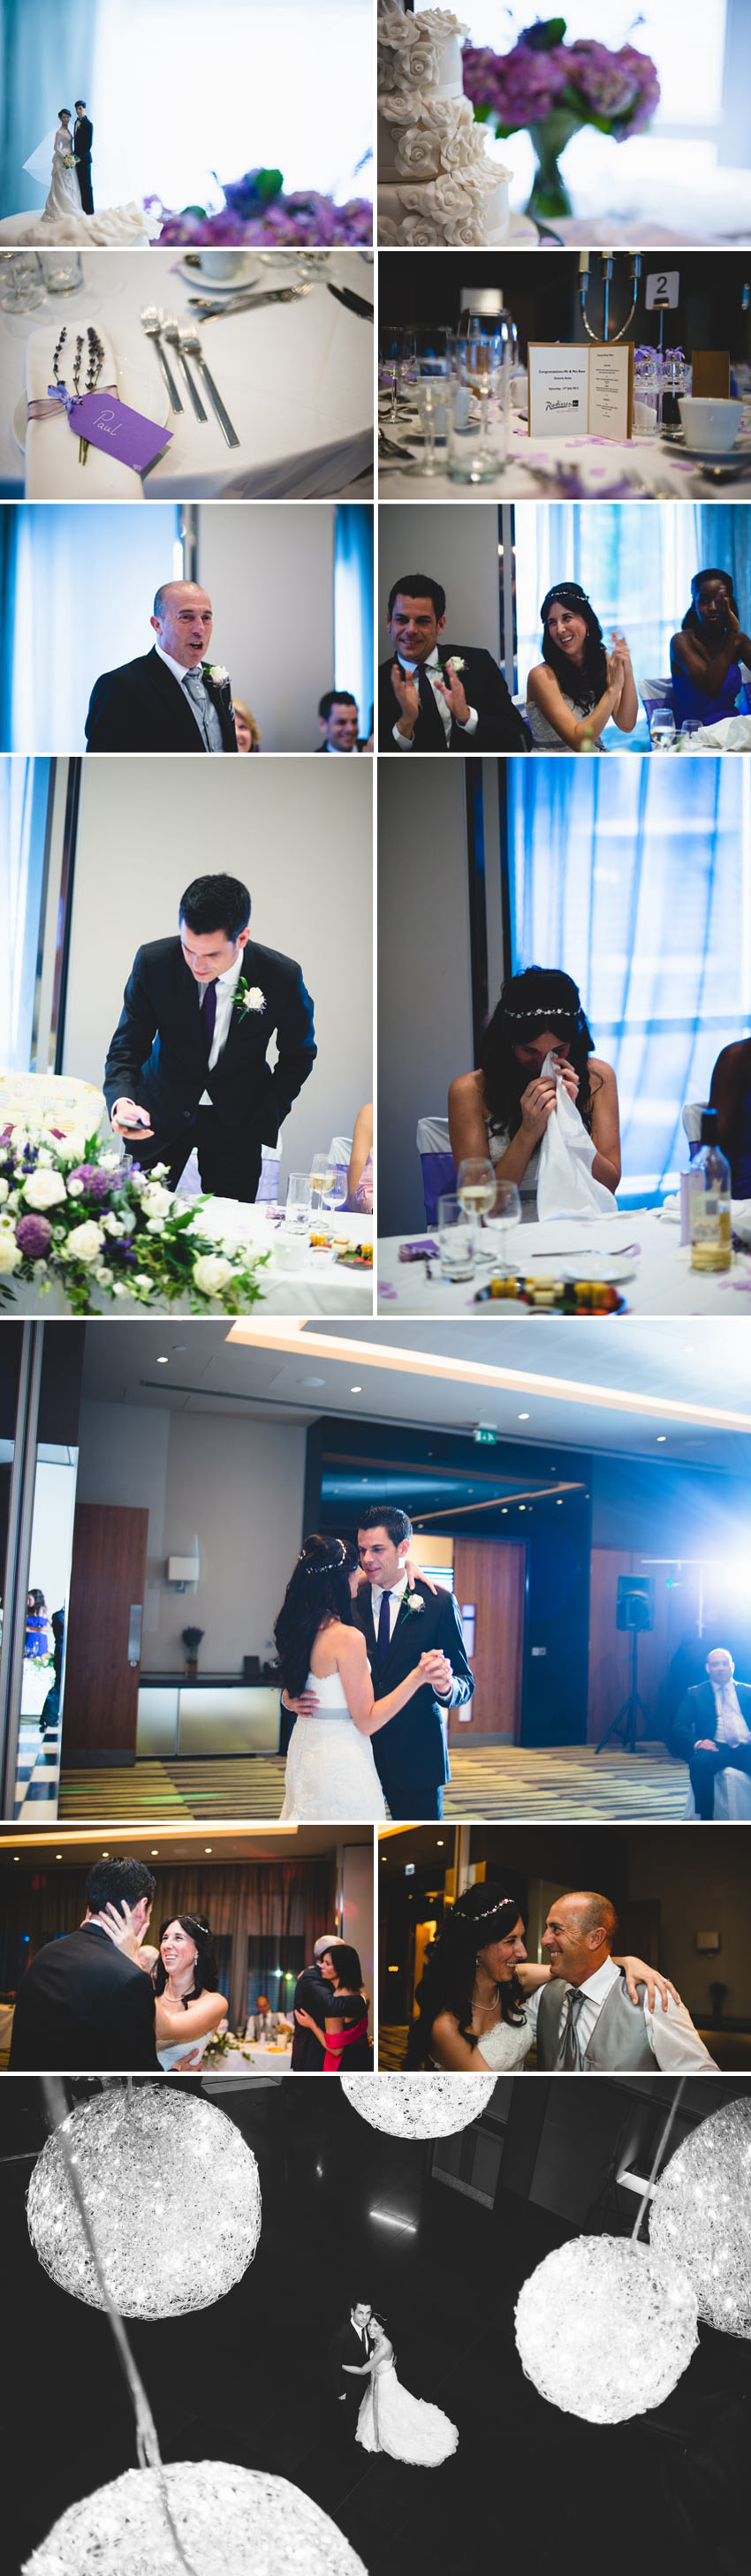 Radisson Blu Hotel London Kent Wedding Photographer Funkypixel Photography